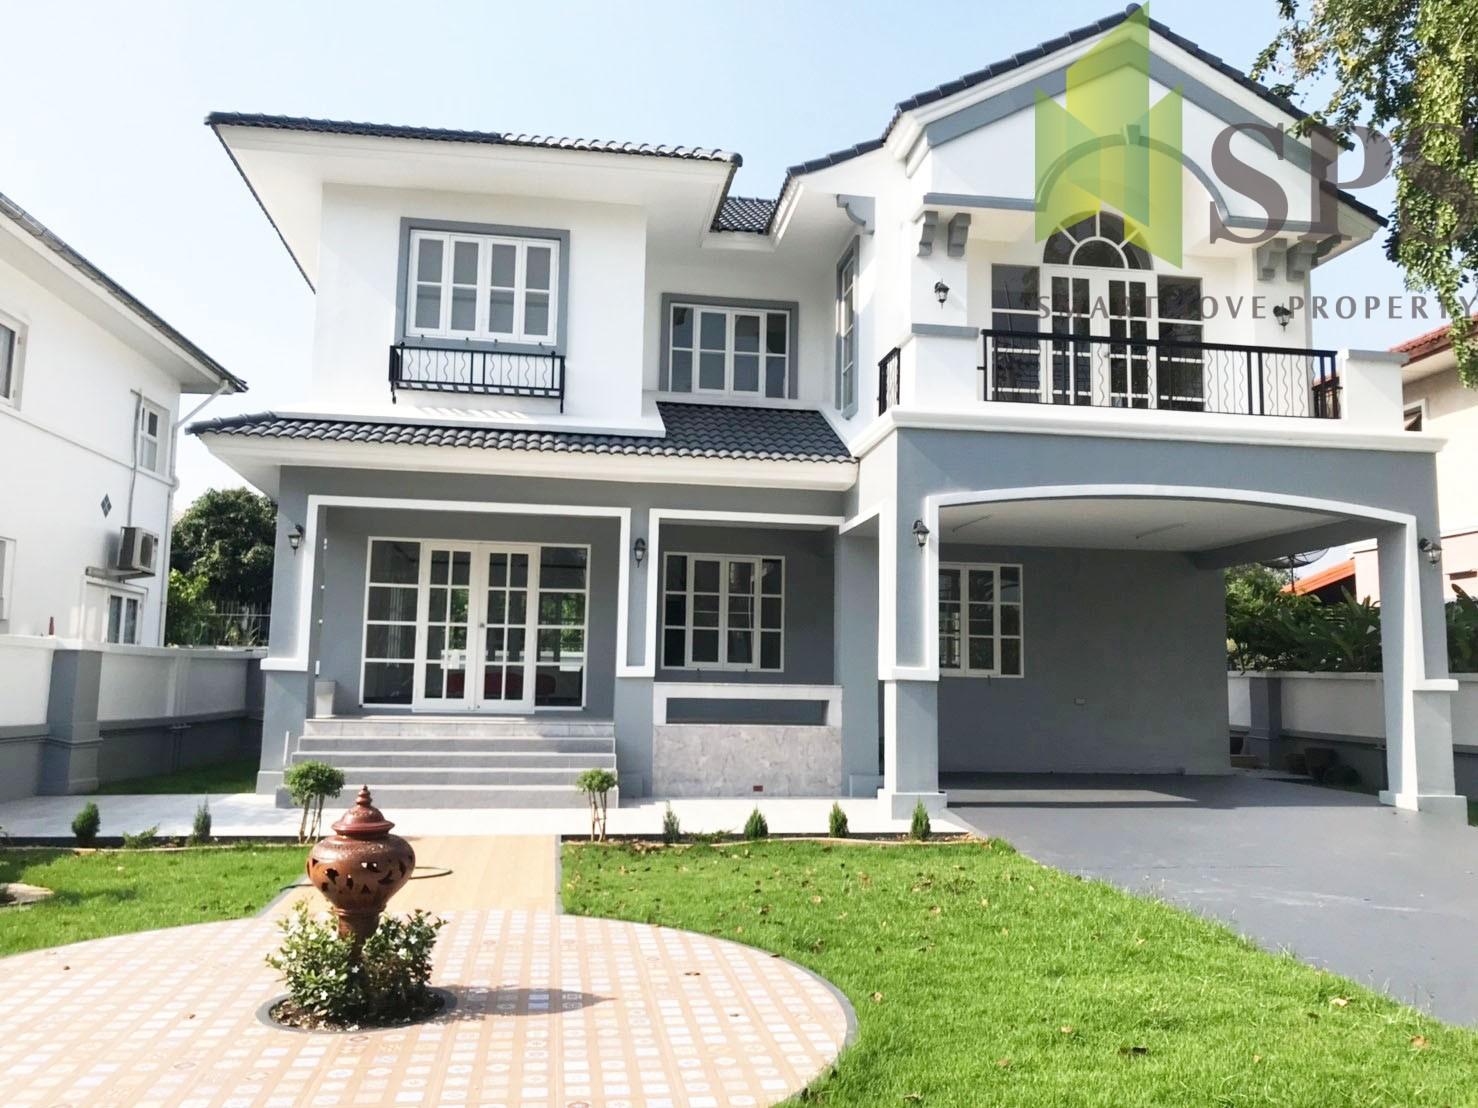 For Rent Single house Nantawan Srinakarin บ้านเดี่ยวให้เช่าโครงการนันทวันศรีนครินทร์ ( SPSPE325)